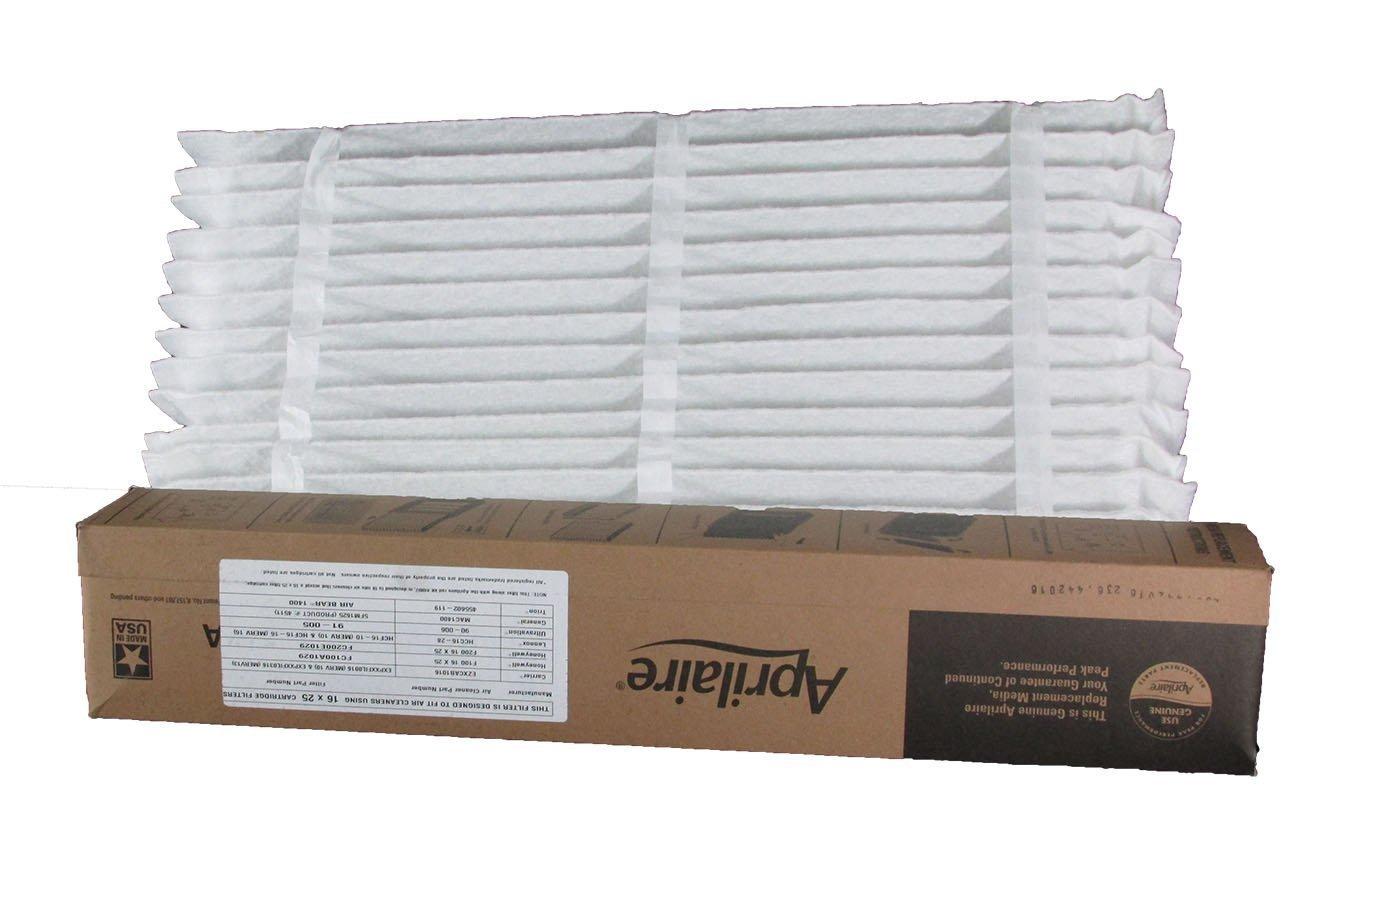 Nordic Pure 12x18x1 Exact MERV 13 Tru Mini Pleat AC Furnace Air Filters 6 Pack